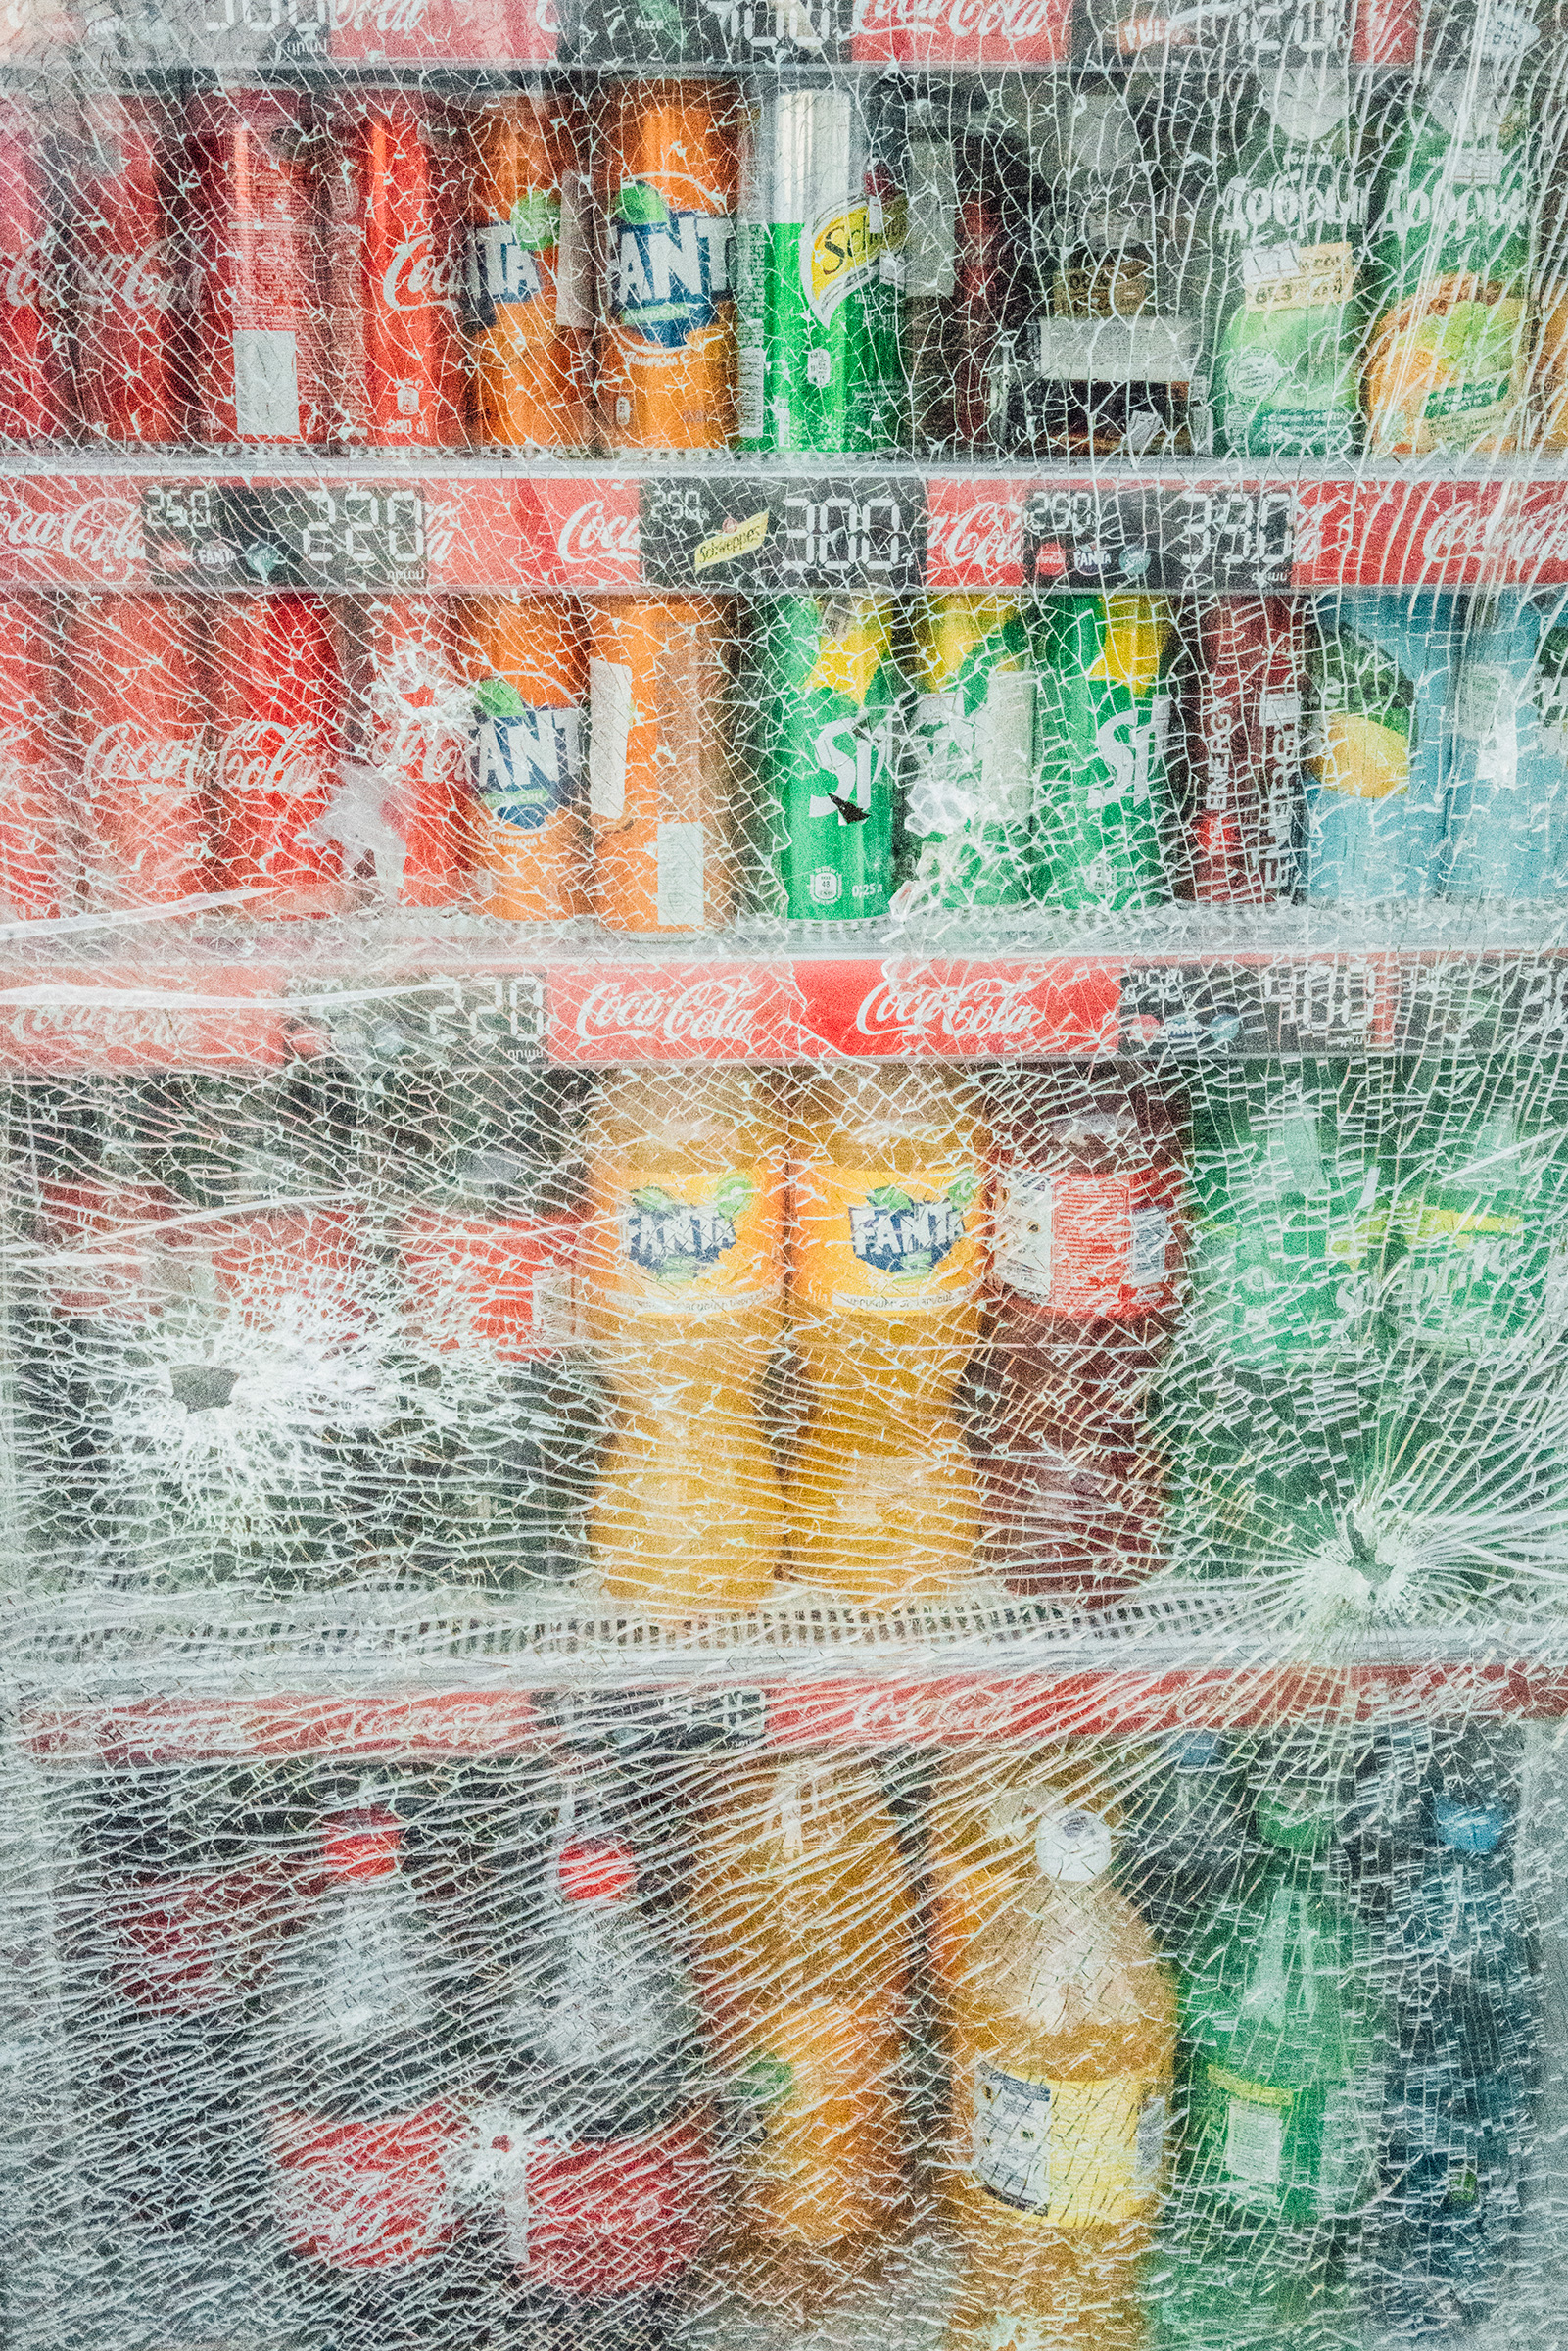 The broken glass of a refrigerator in Stepanakert.